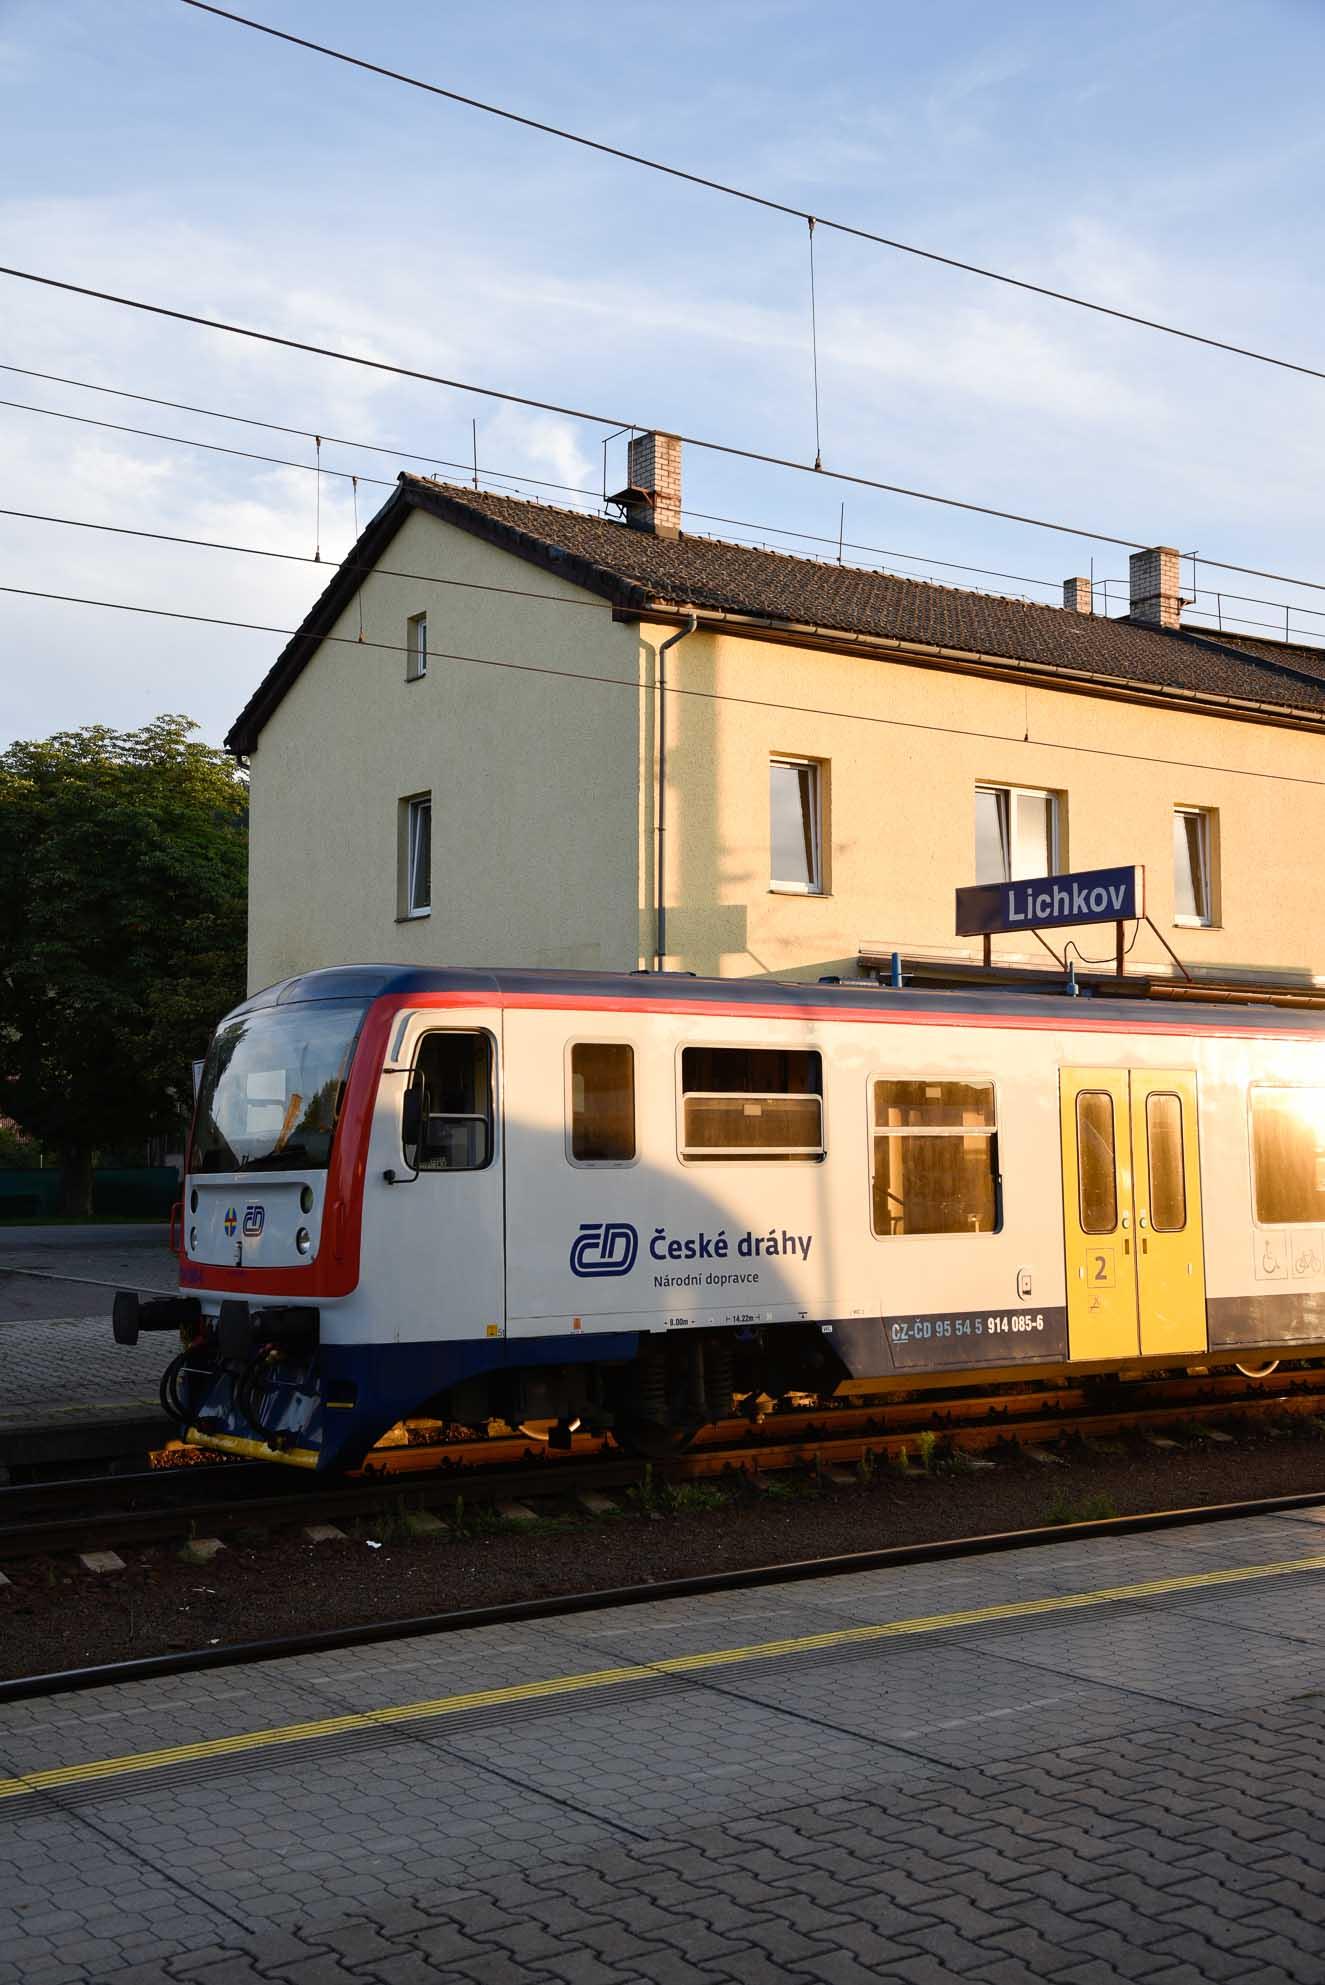 Train-at-Lichkov-station